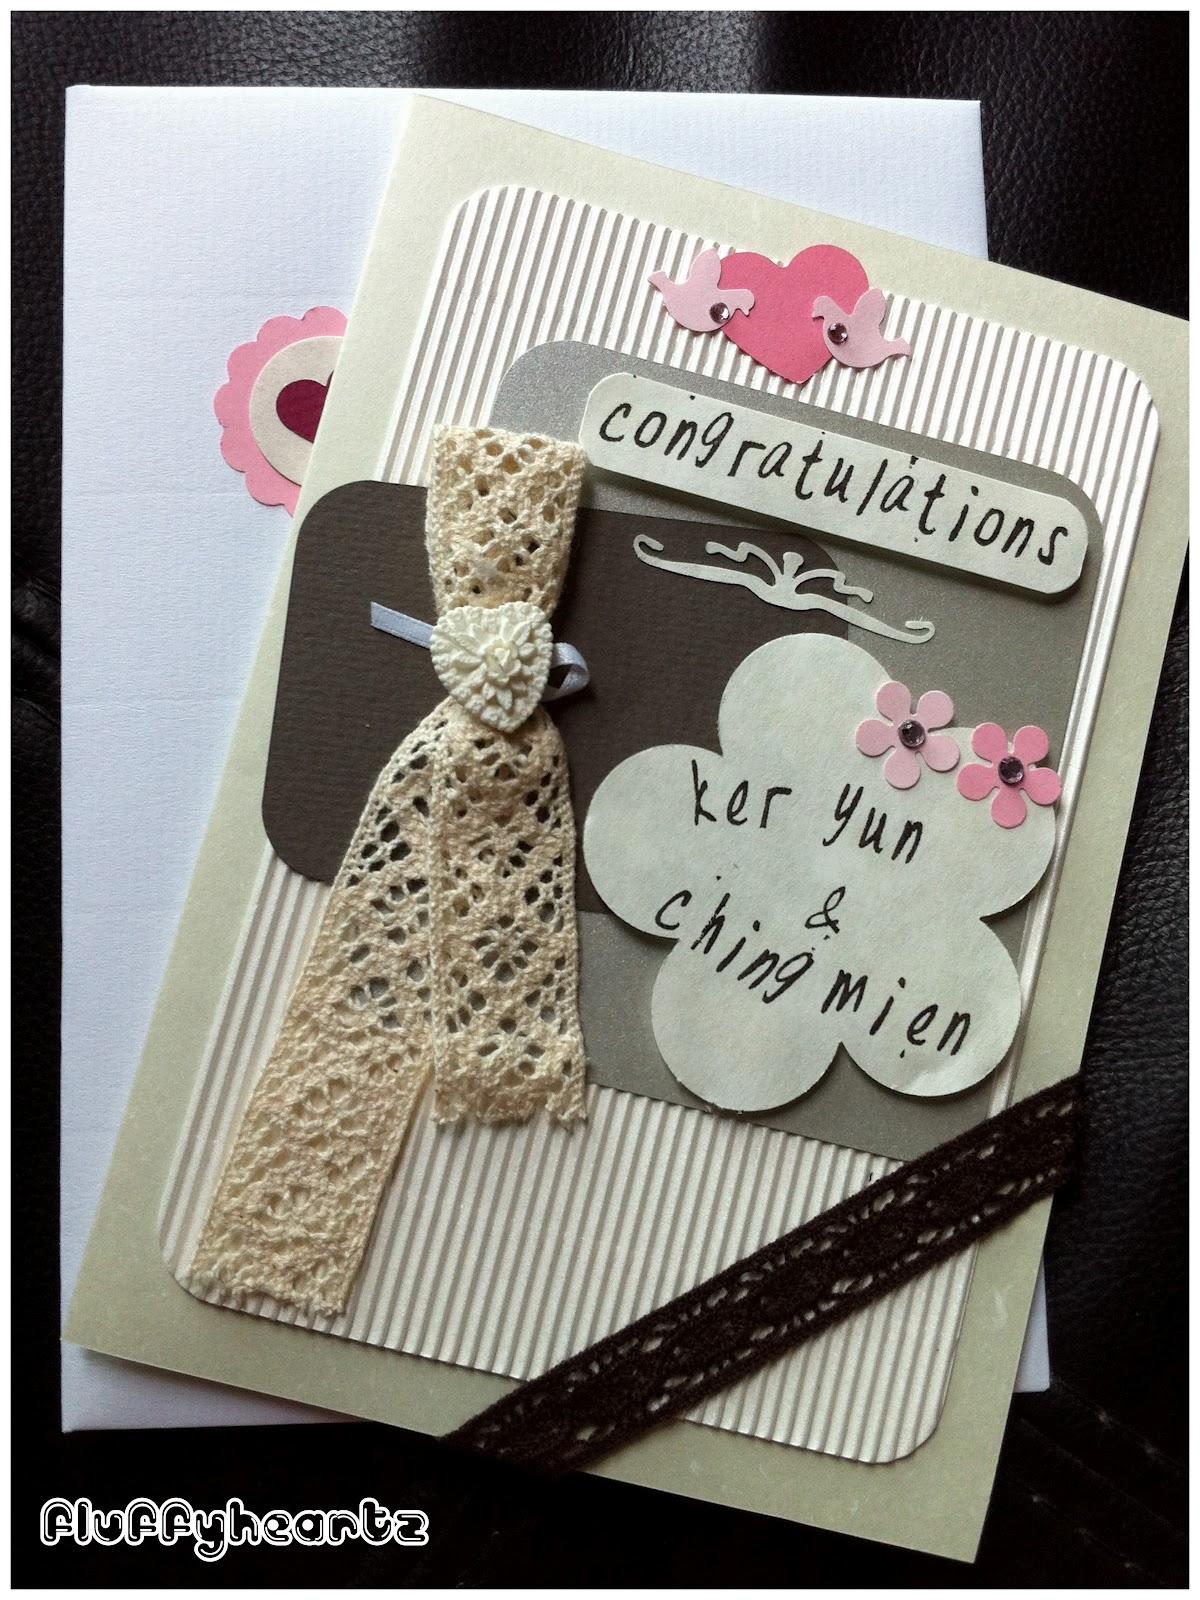 Fluffyheartz ♥: Personalized Wedding Congratulations Card